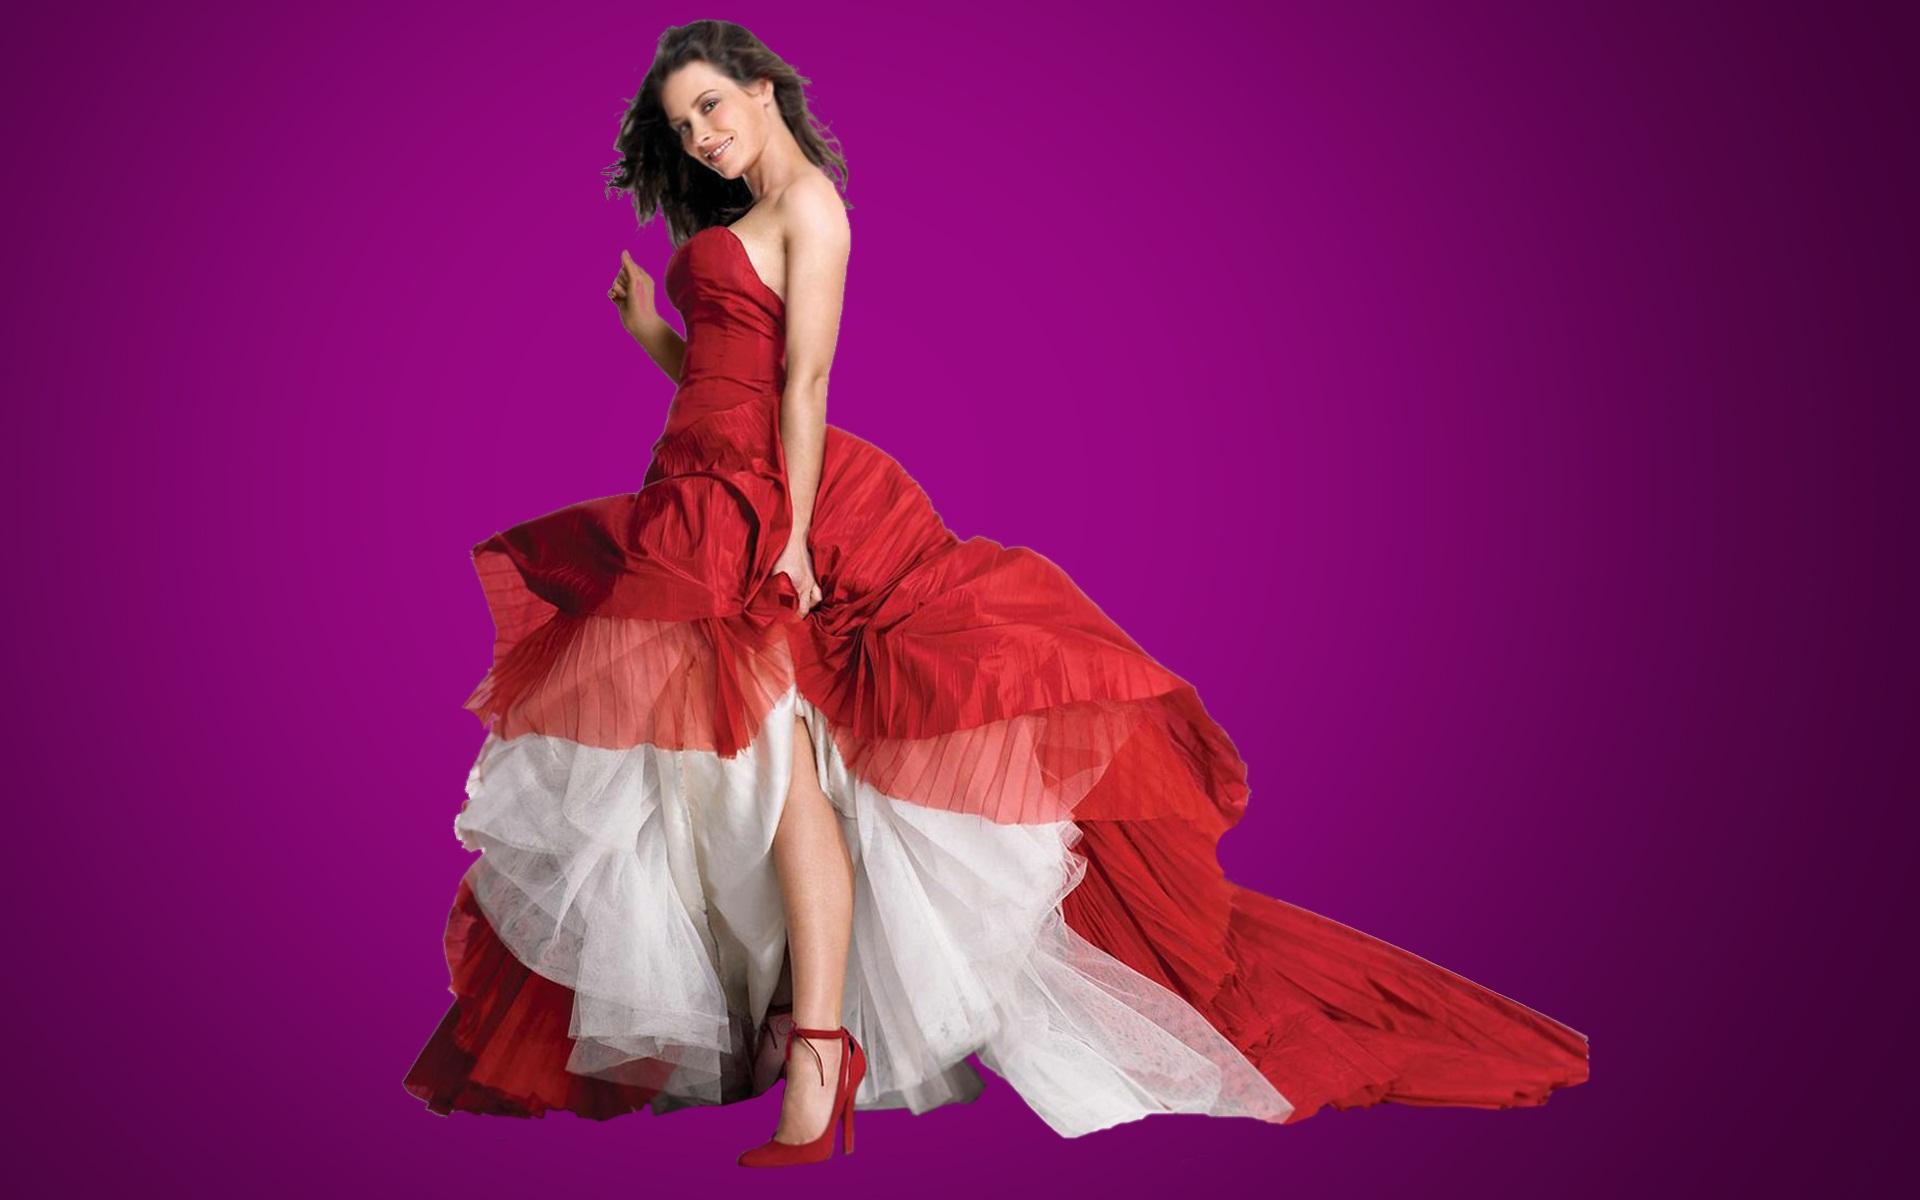 Beautiful Stylish Girl Wallpaper - Real Pic Beautiful And Stylish Girls , HD Wallpaper & Backgrounds